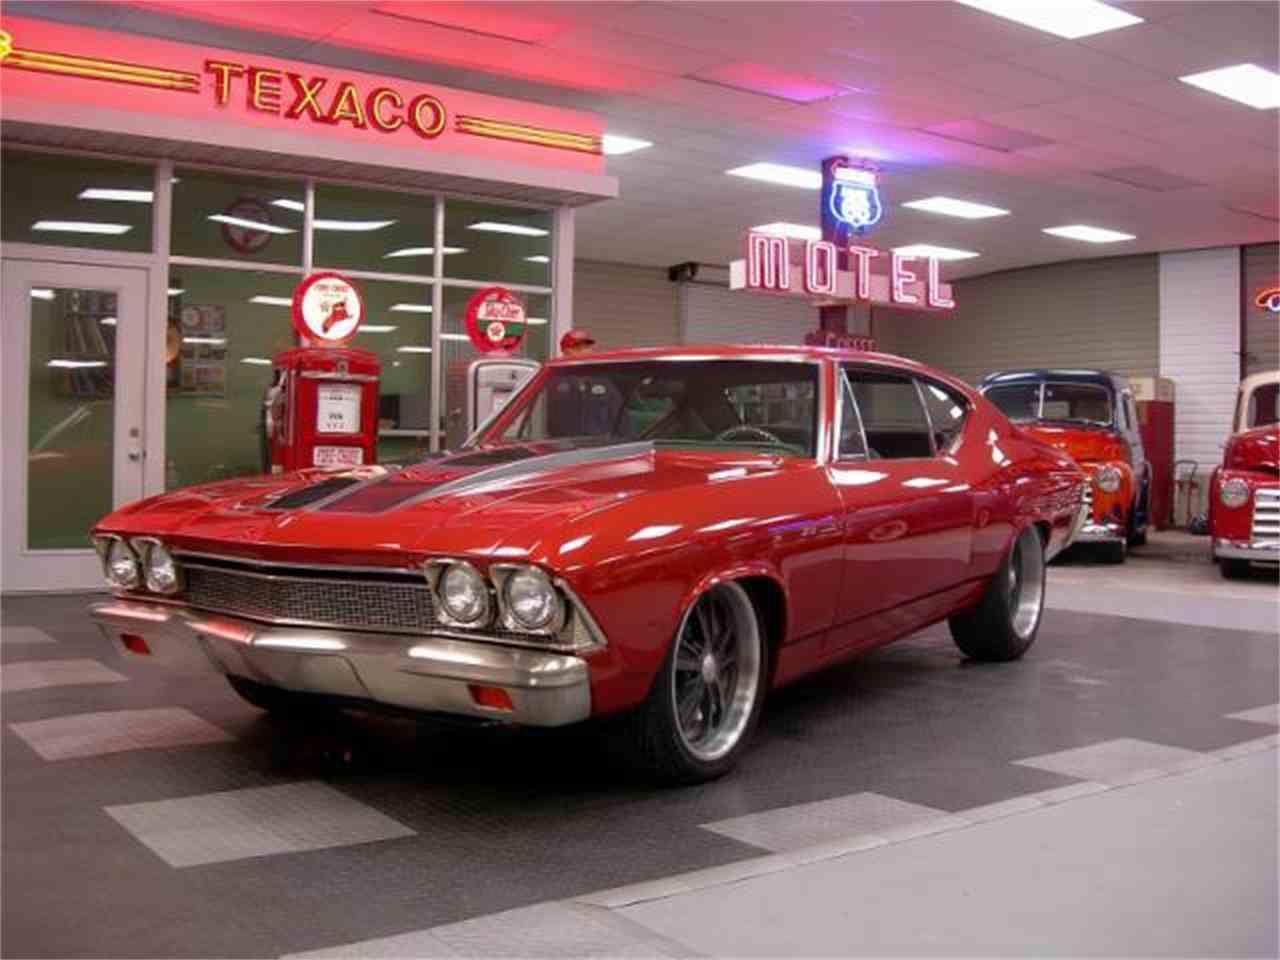 1968 Chevrolet Chevelle for Sale | ClassicCars.com | CC-618385